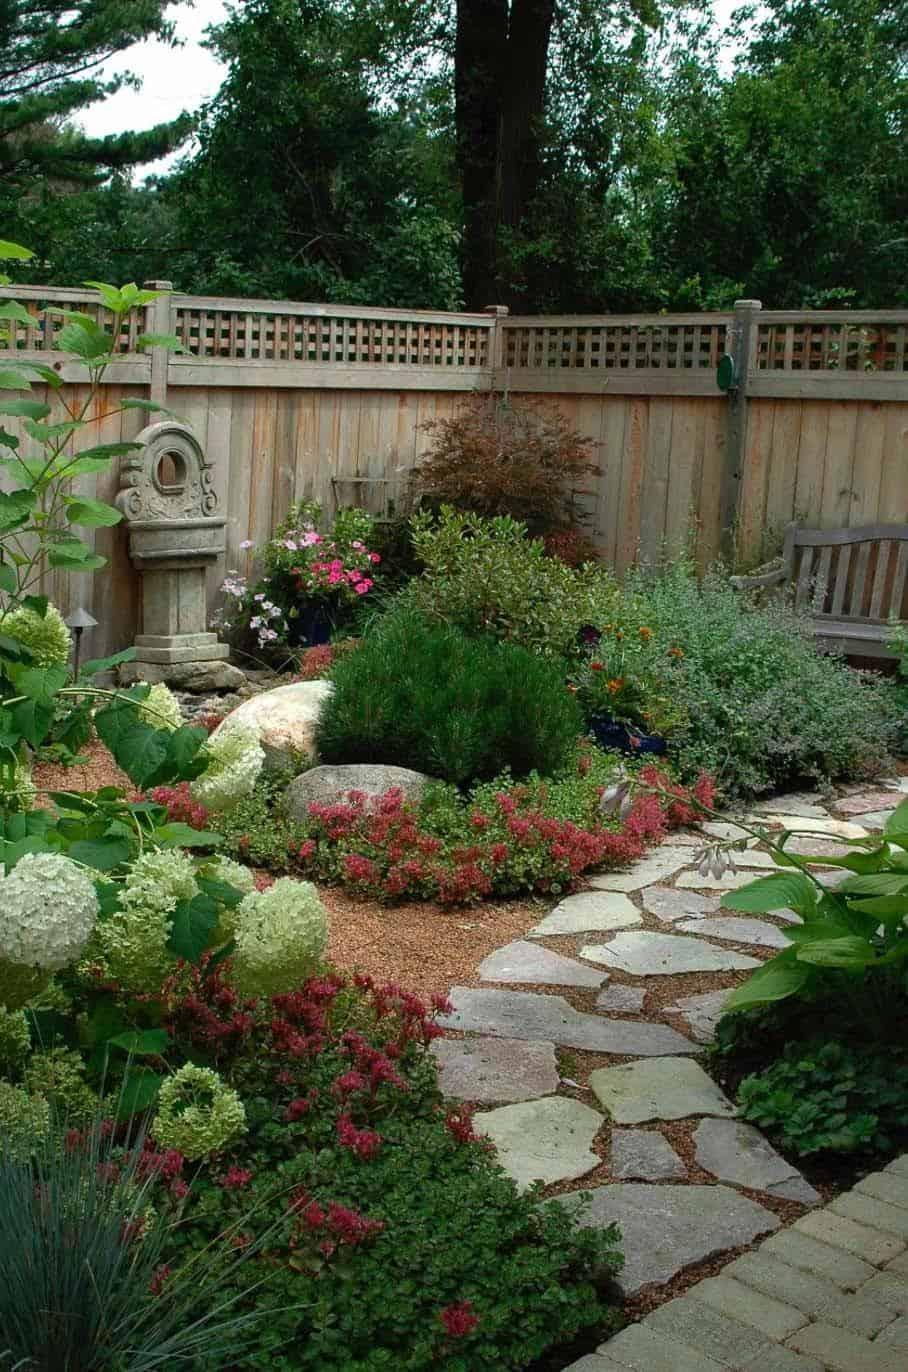 40 brilliant ideas for stone pathways in your garden